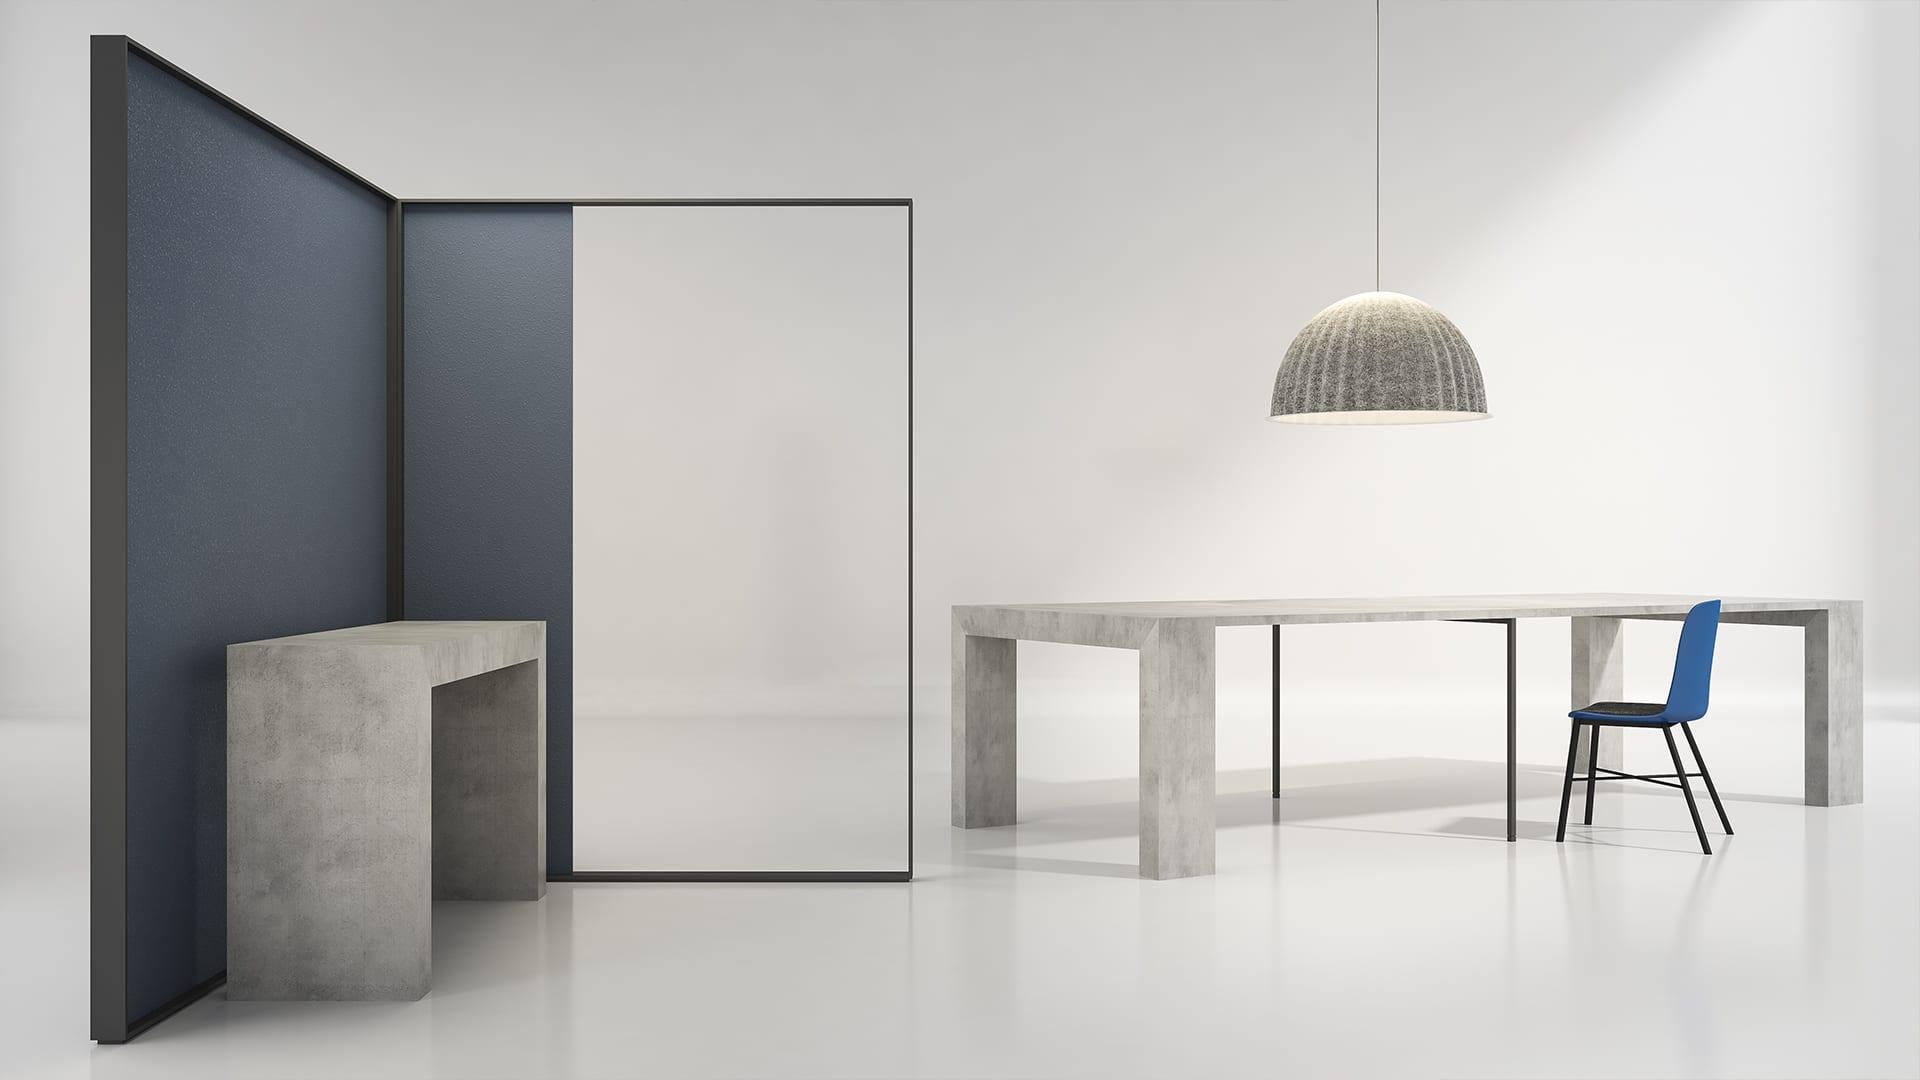 Maayan-Golan_Architectural-Visualization_3d-product-visualization_zaga-dining_concrete-stool_03